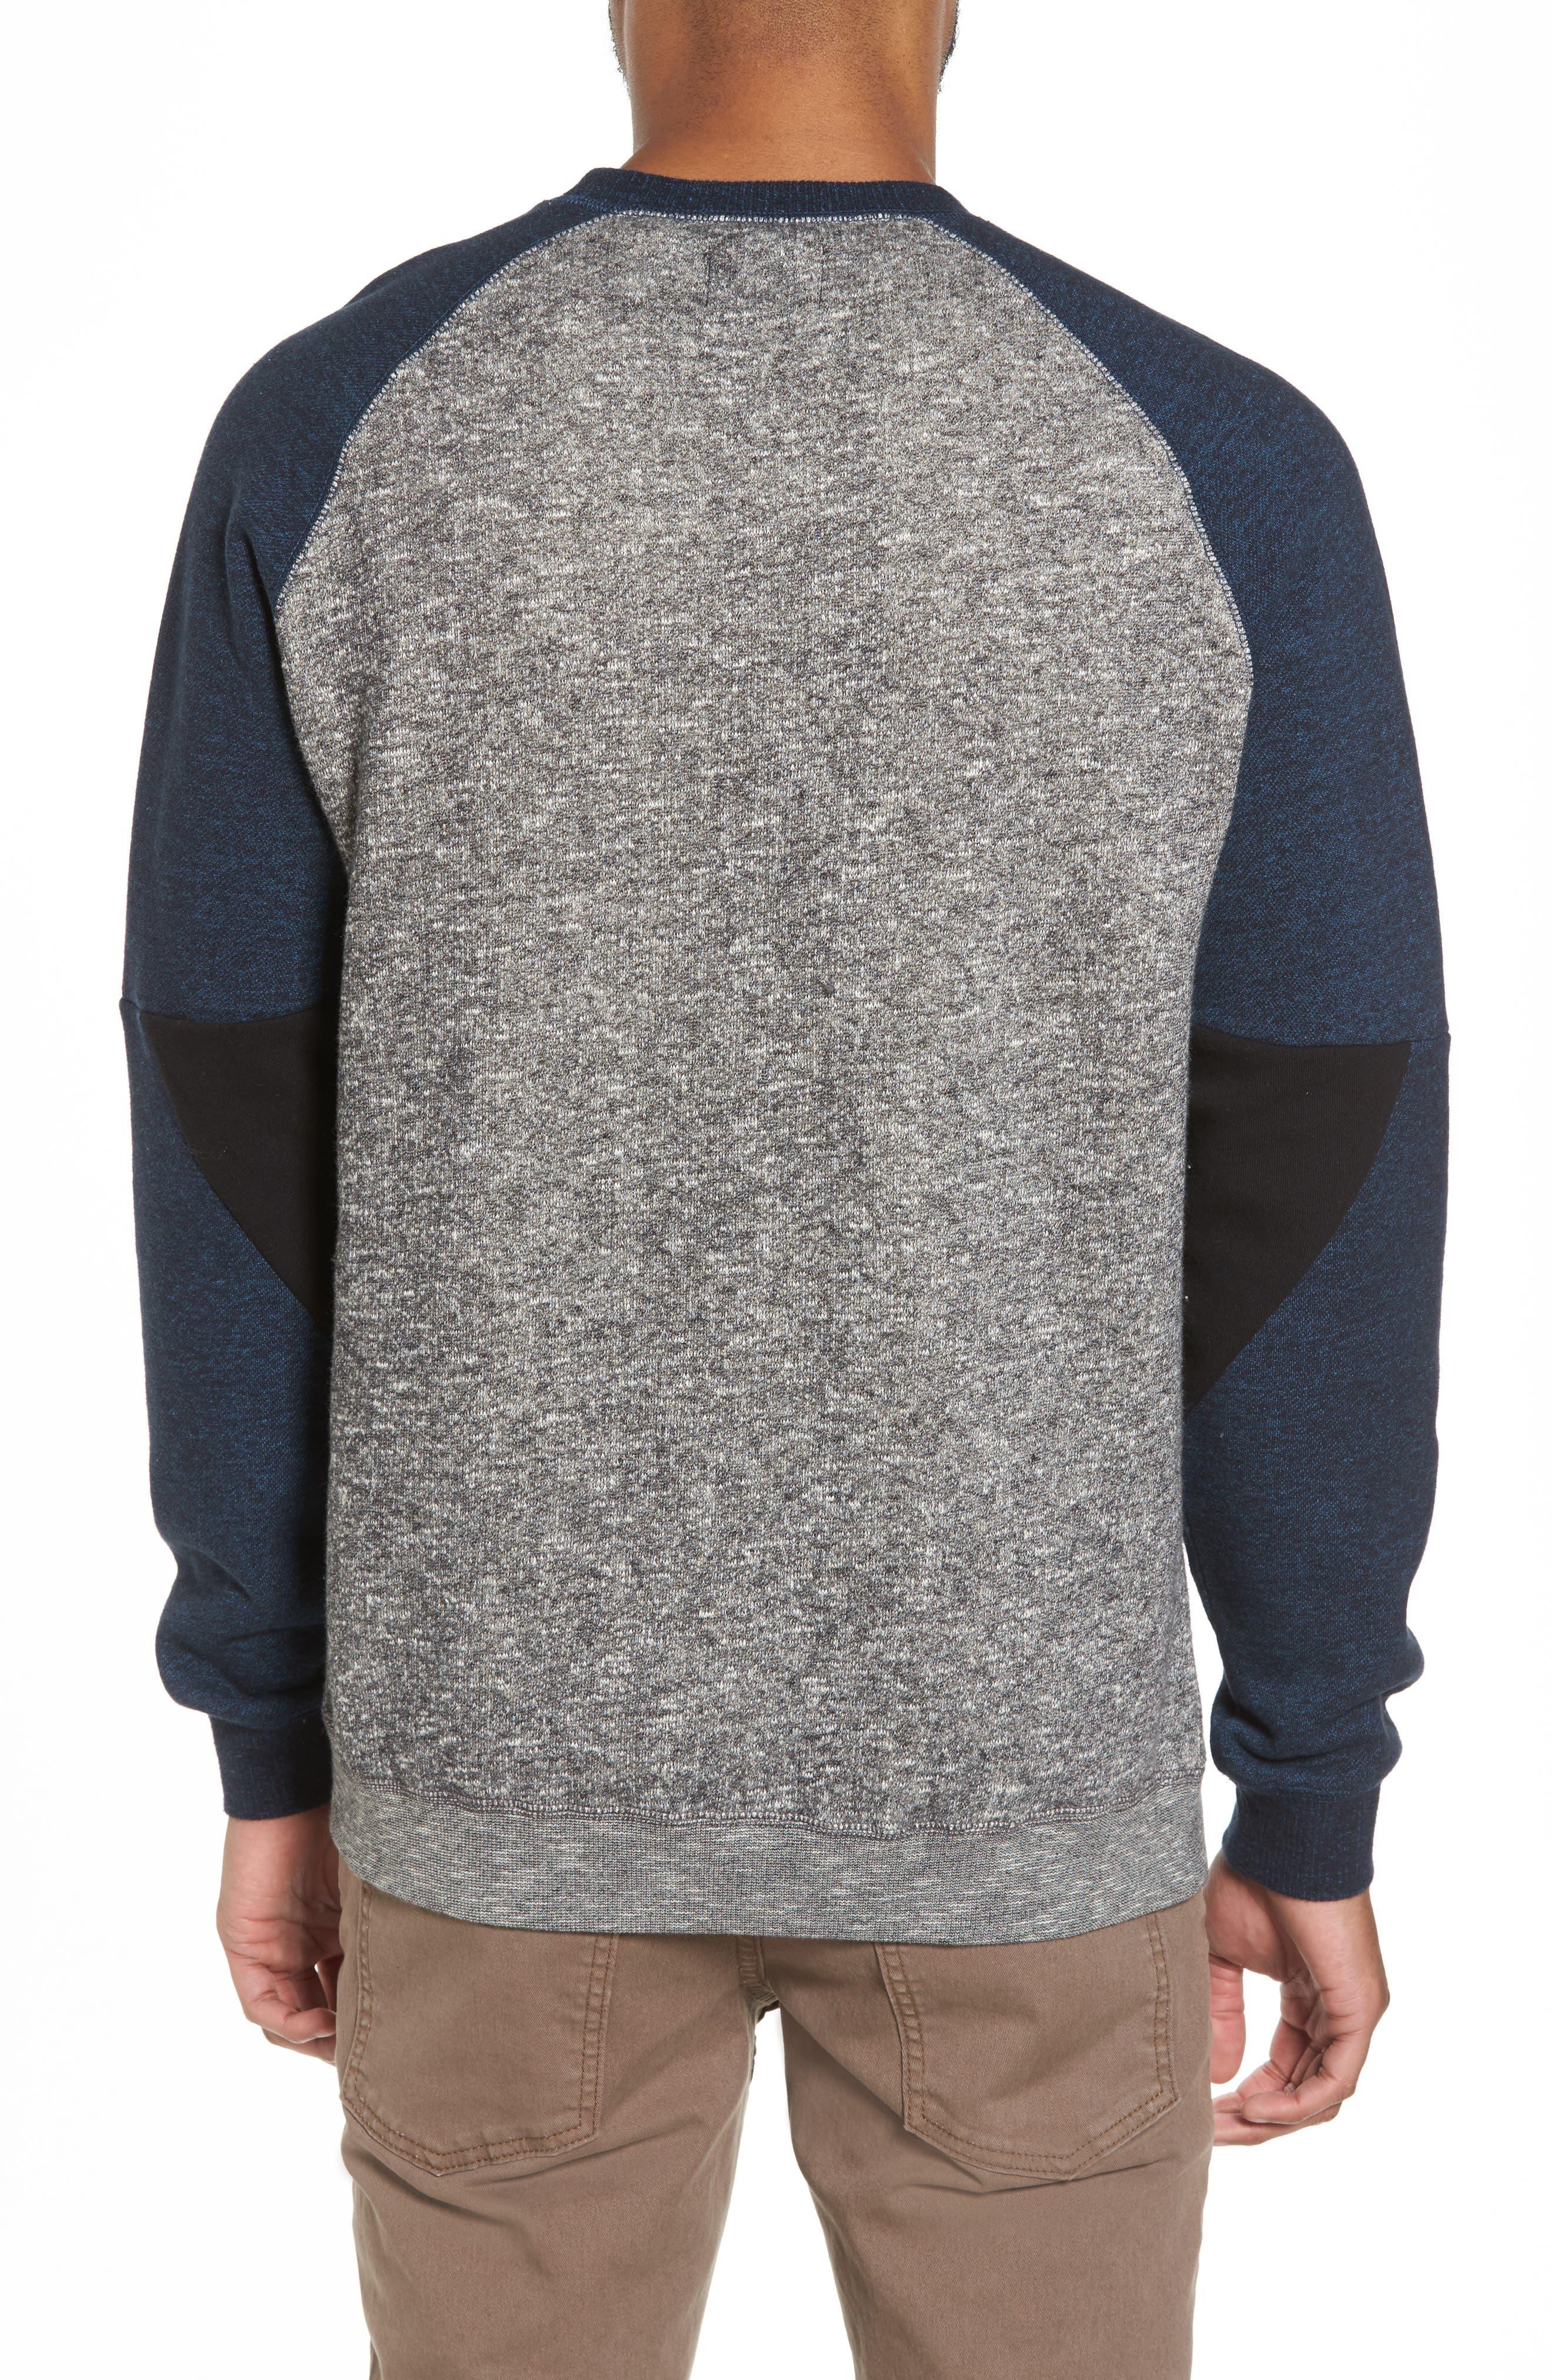 Winson Graphic Sweatshirt,                             Alternate thumbnail 2, color,                             Grey Speckle